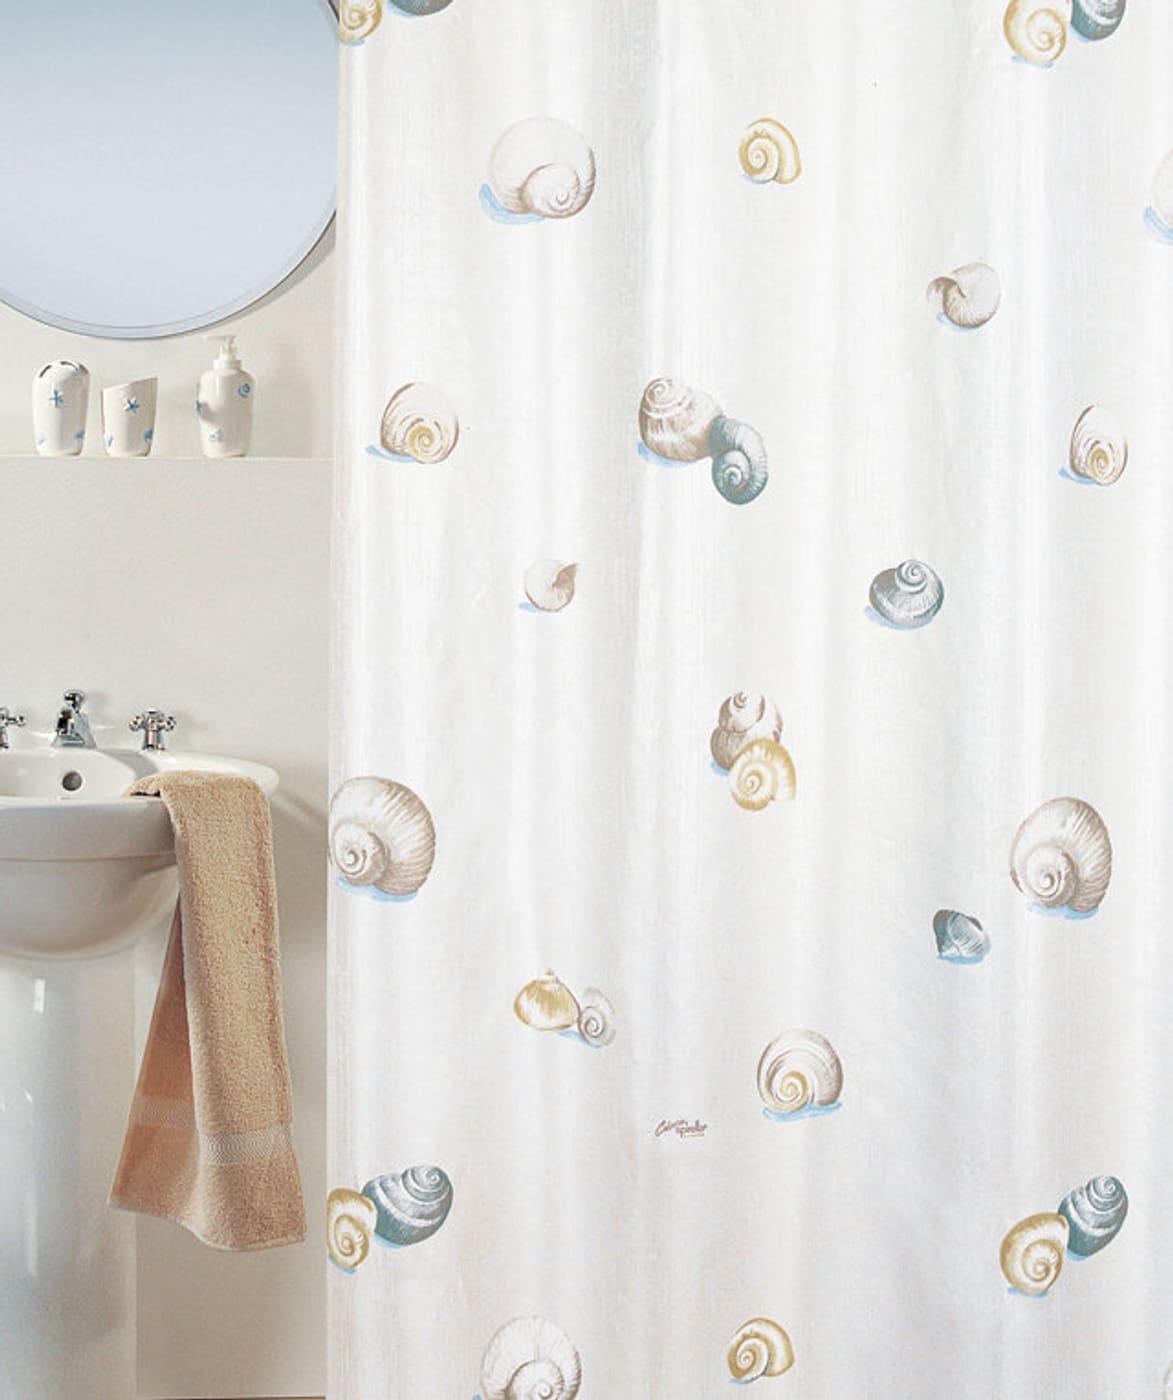 spirella duschvorhang escargot migros. Black Bedroom Furniture Sets. Home Design Ideas